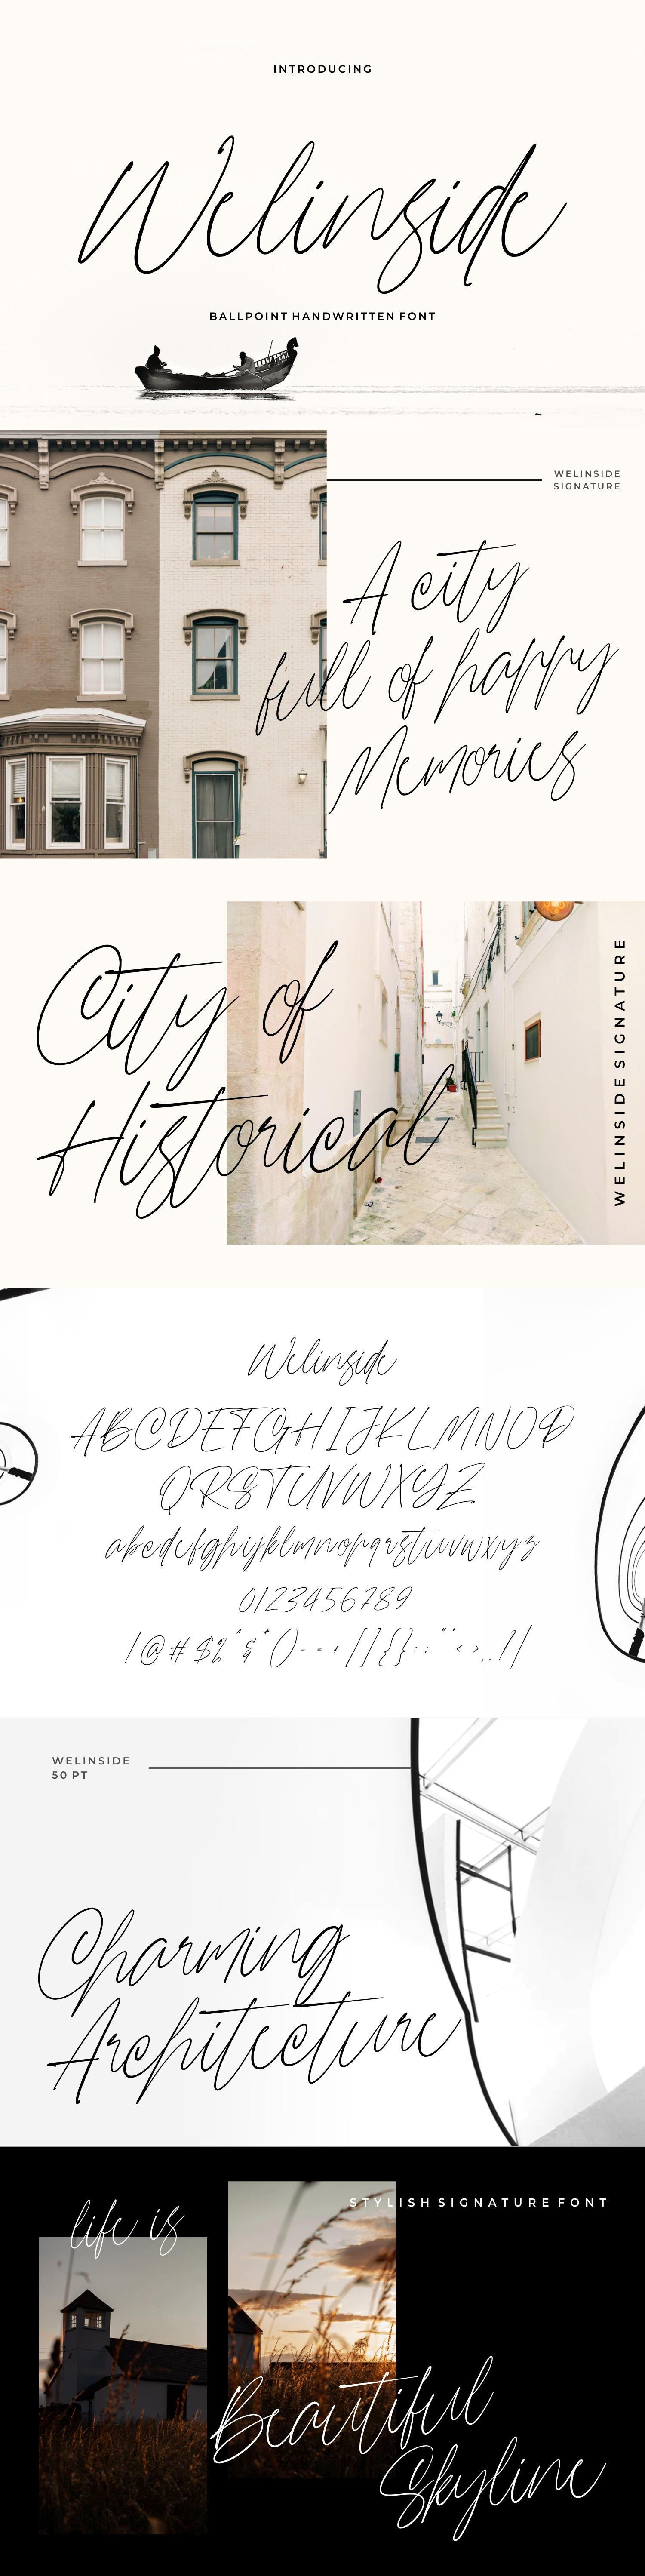 Wellinside - Handwritten Font example image 9